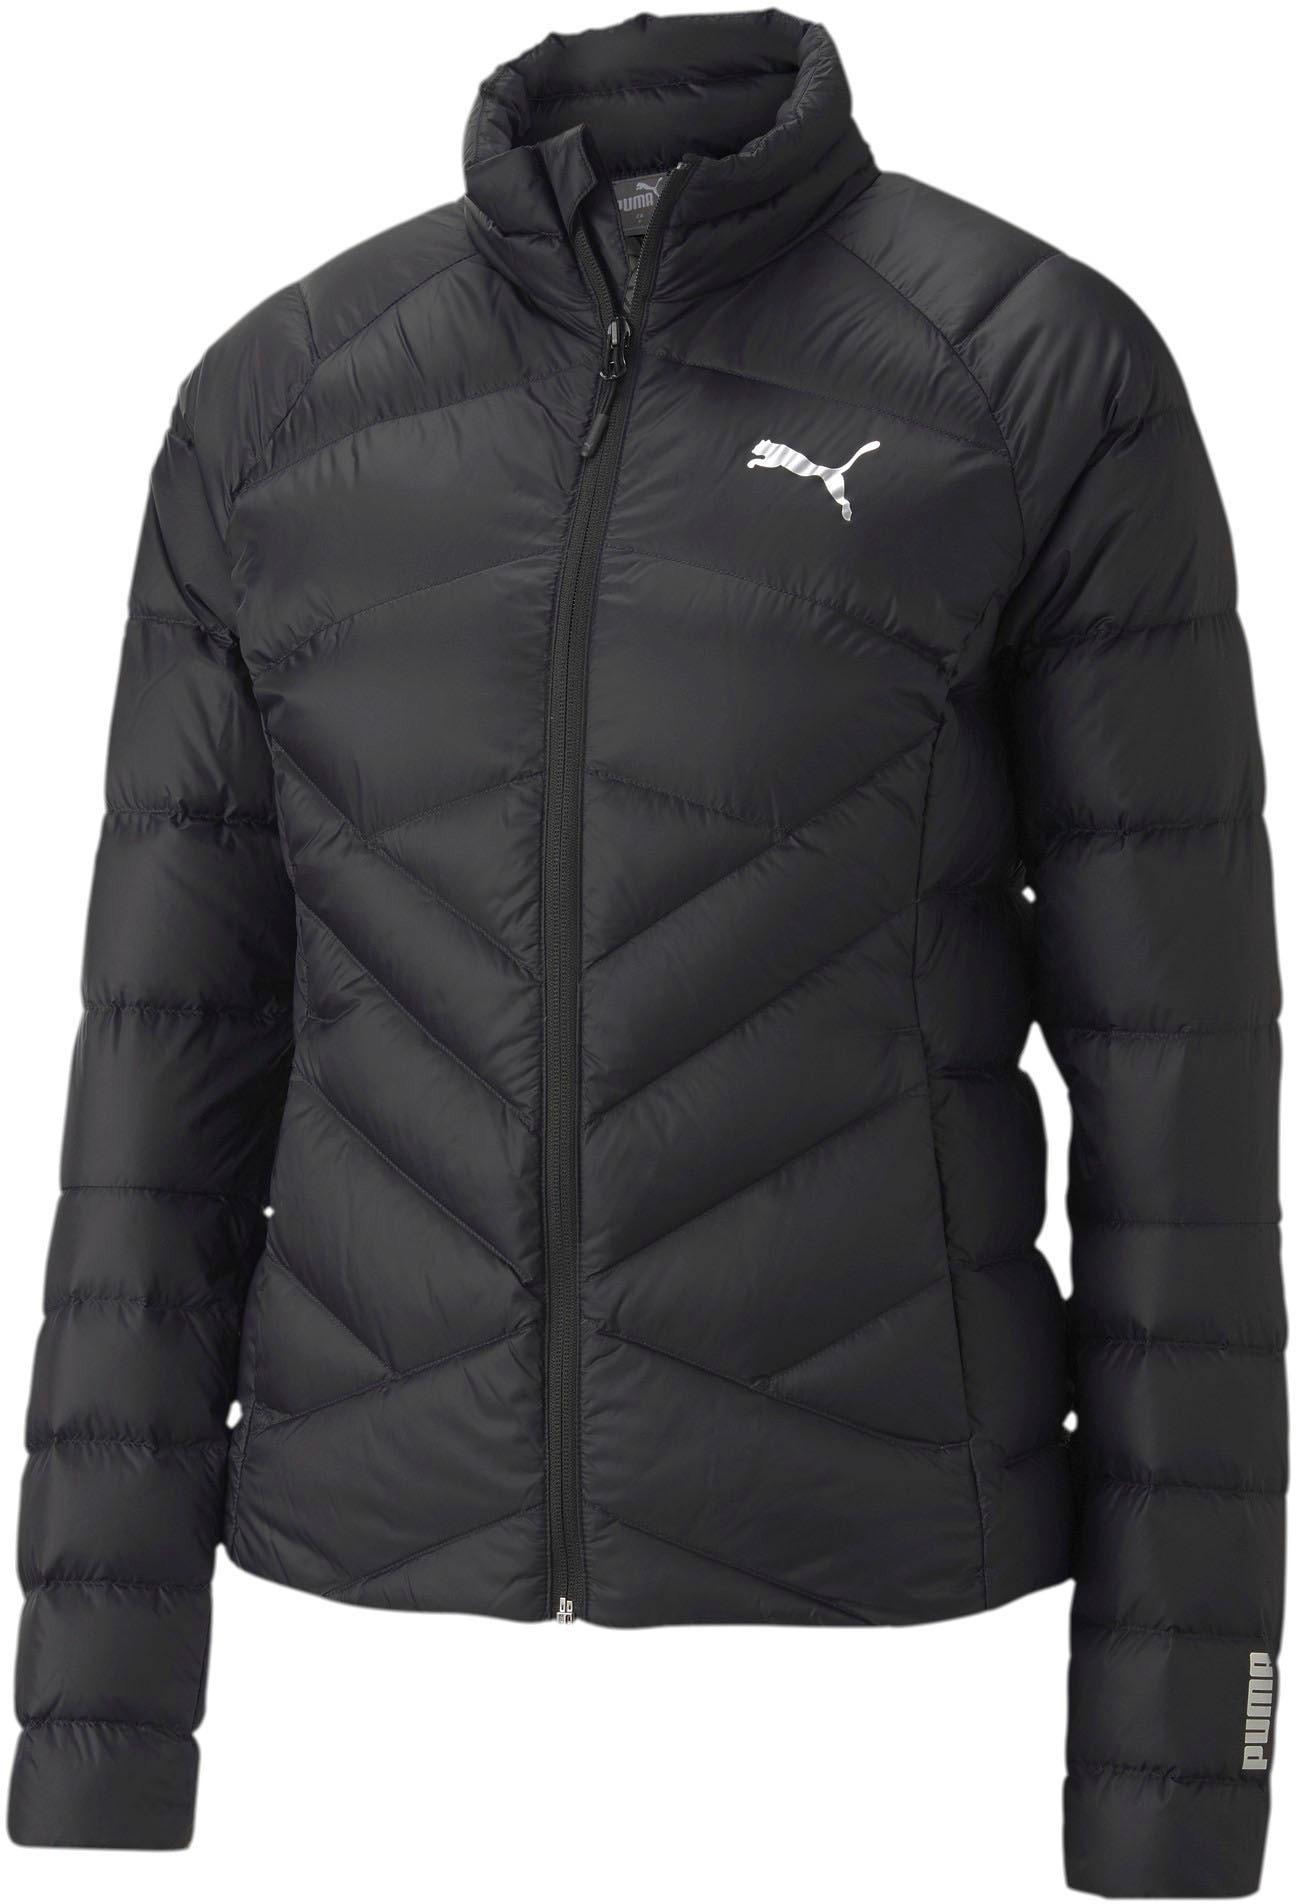 puma -  Daunenjacke PWRWarm packLITE Down Jacket